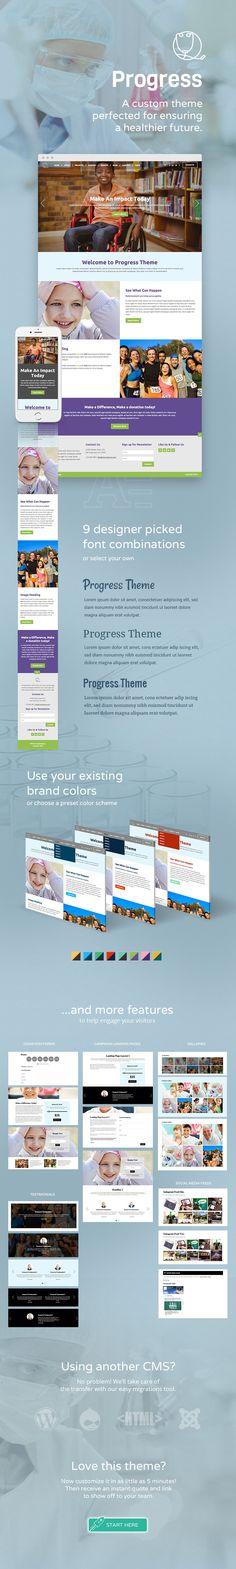 Use Morweb CMS to build a custom website for your nonprofit or association. Custom Website, Website Themes, Non Profit, Software, Health, Design, Health Care, Salud, Design Comics